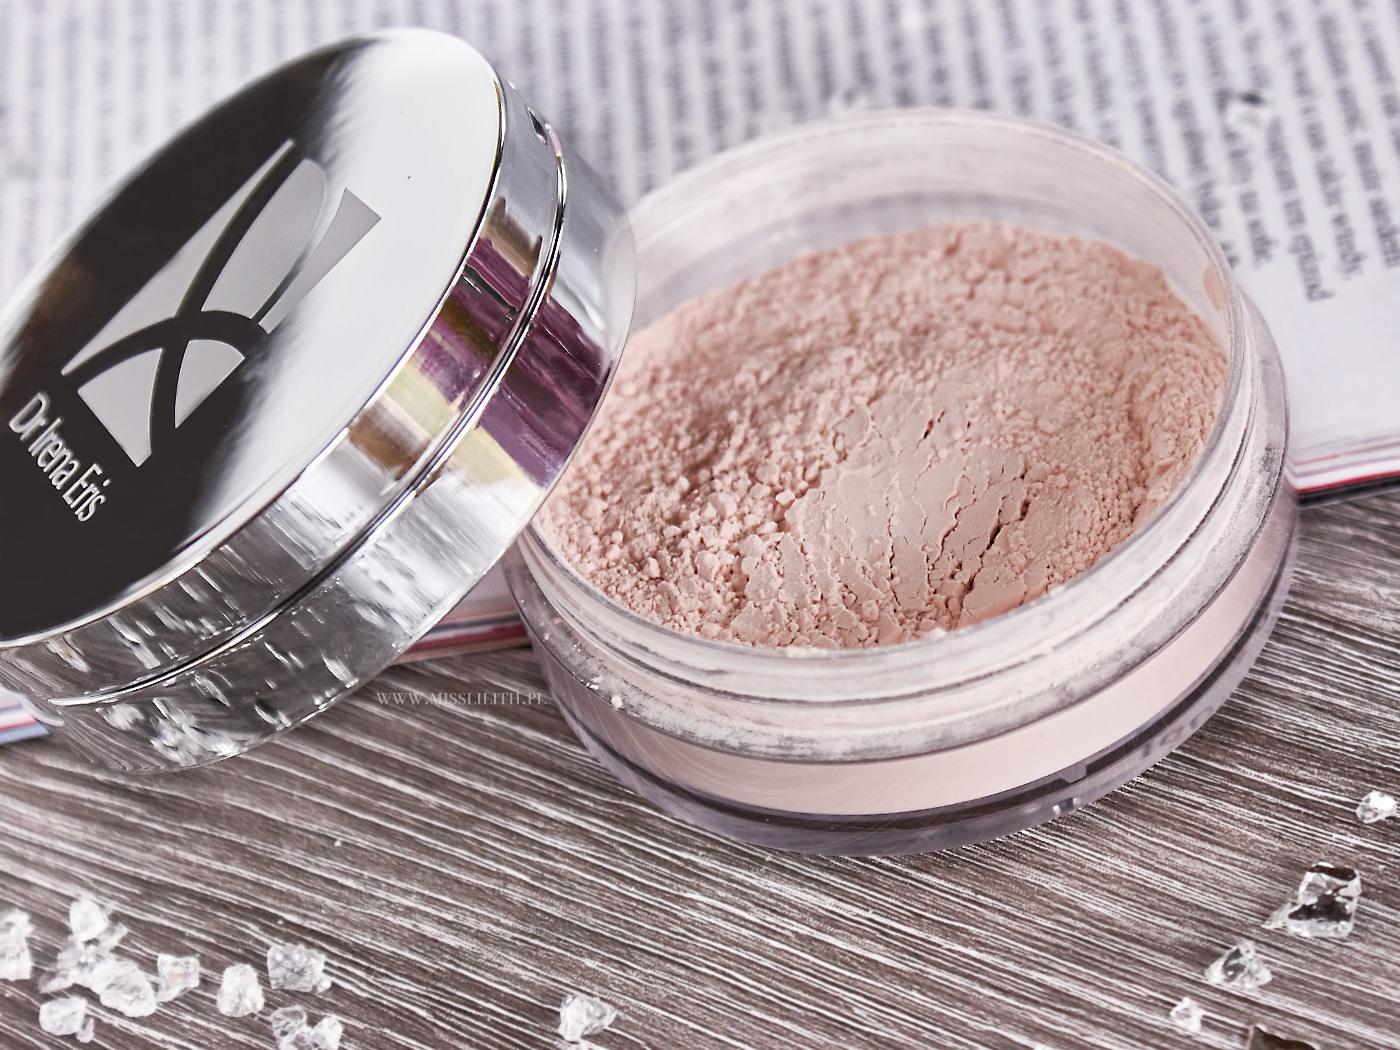 Dr Irena Eris Provoke Loose Powder Transparentny puder sypki blog opinie